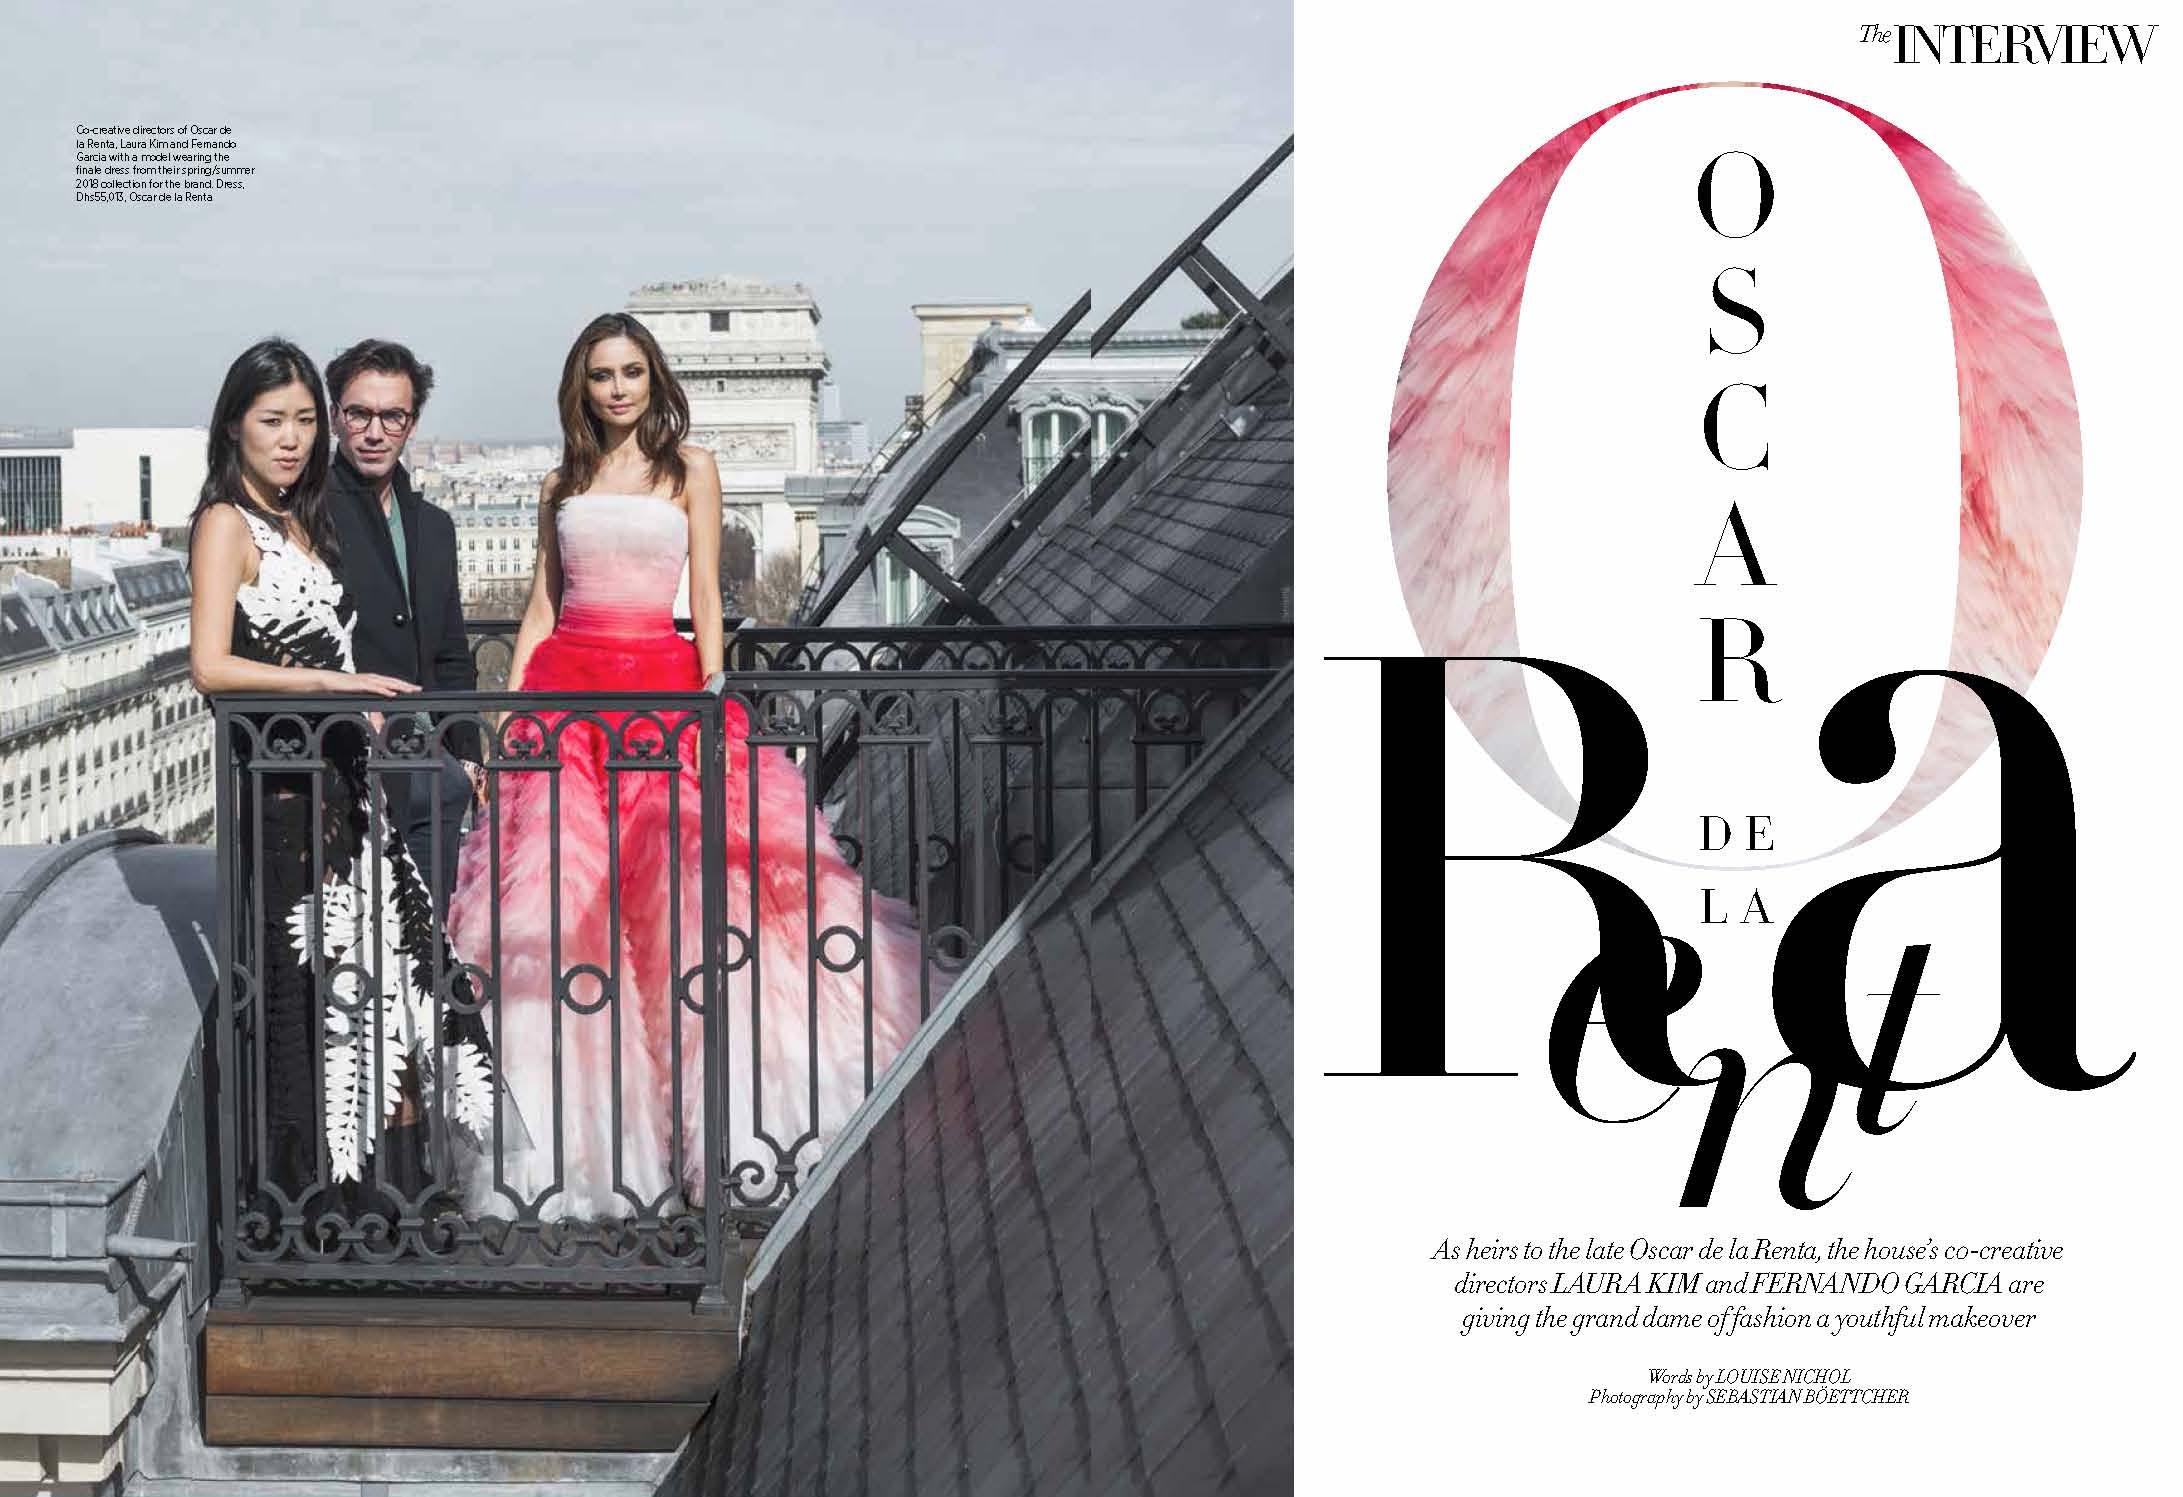 Oscar de la Renta's Laura Kim and Fernando Garcia, April 2018